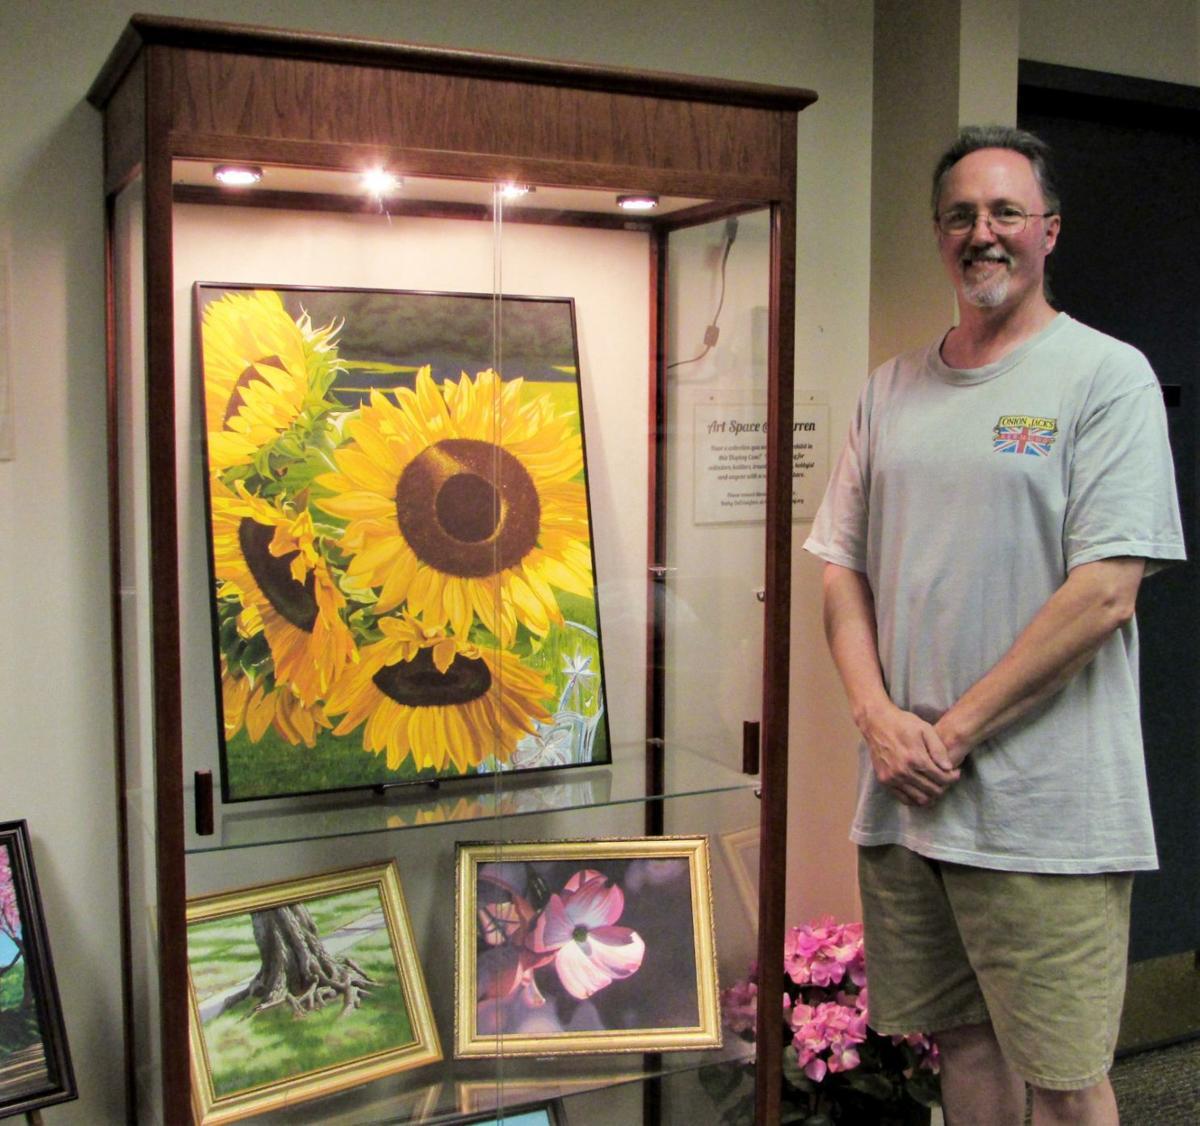 Mark Kreiss with artwork